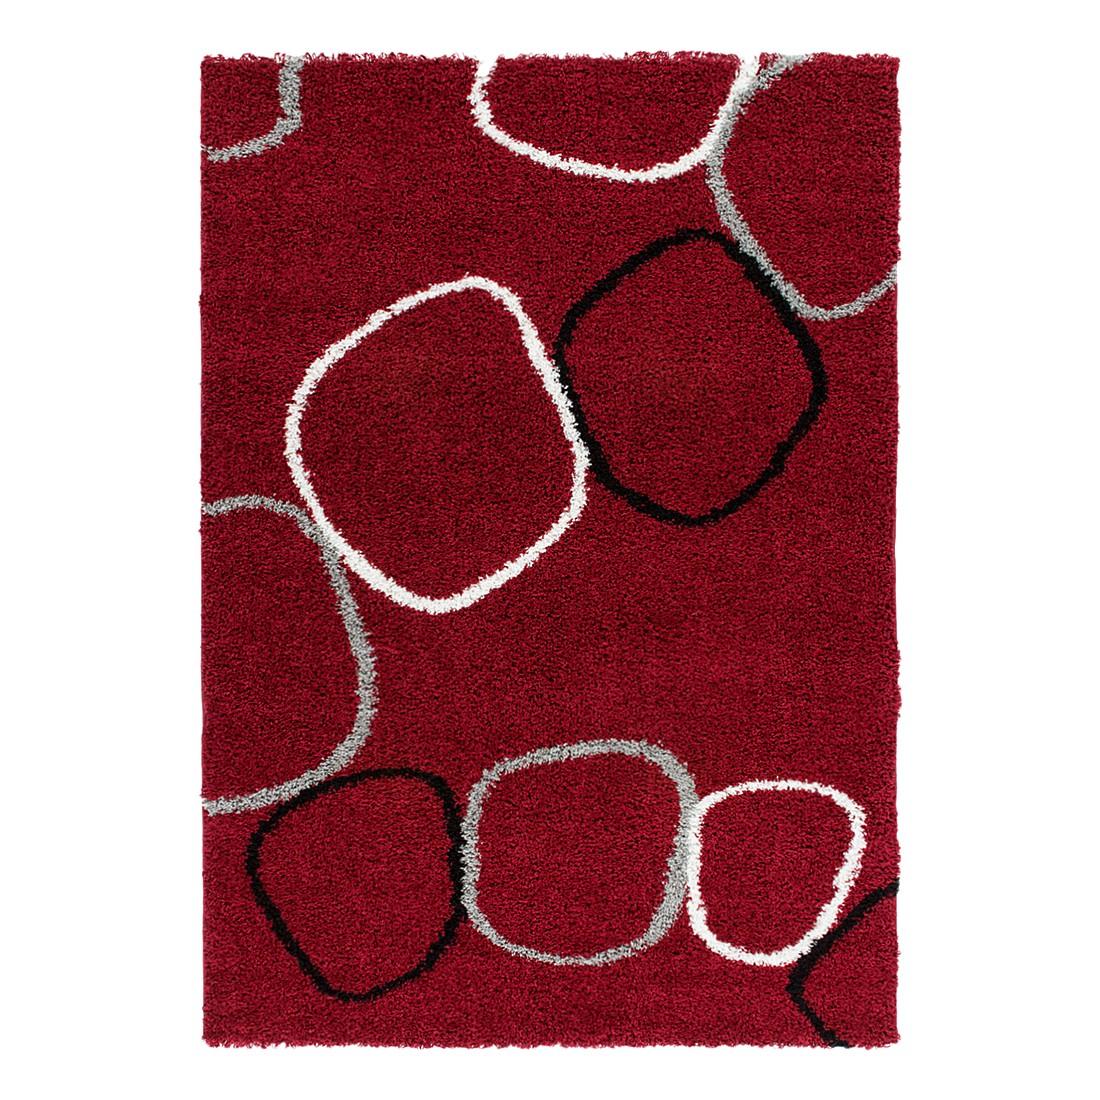 Teppich Bolivia – El Alto – Rot – 160 x 230 cm, Kayoom bestellen